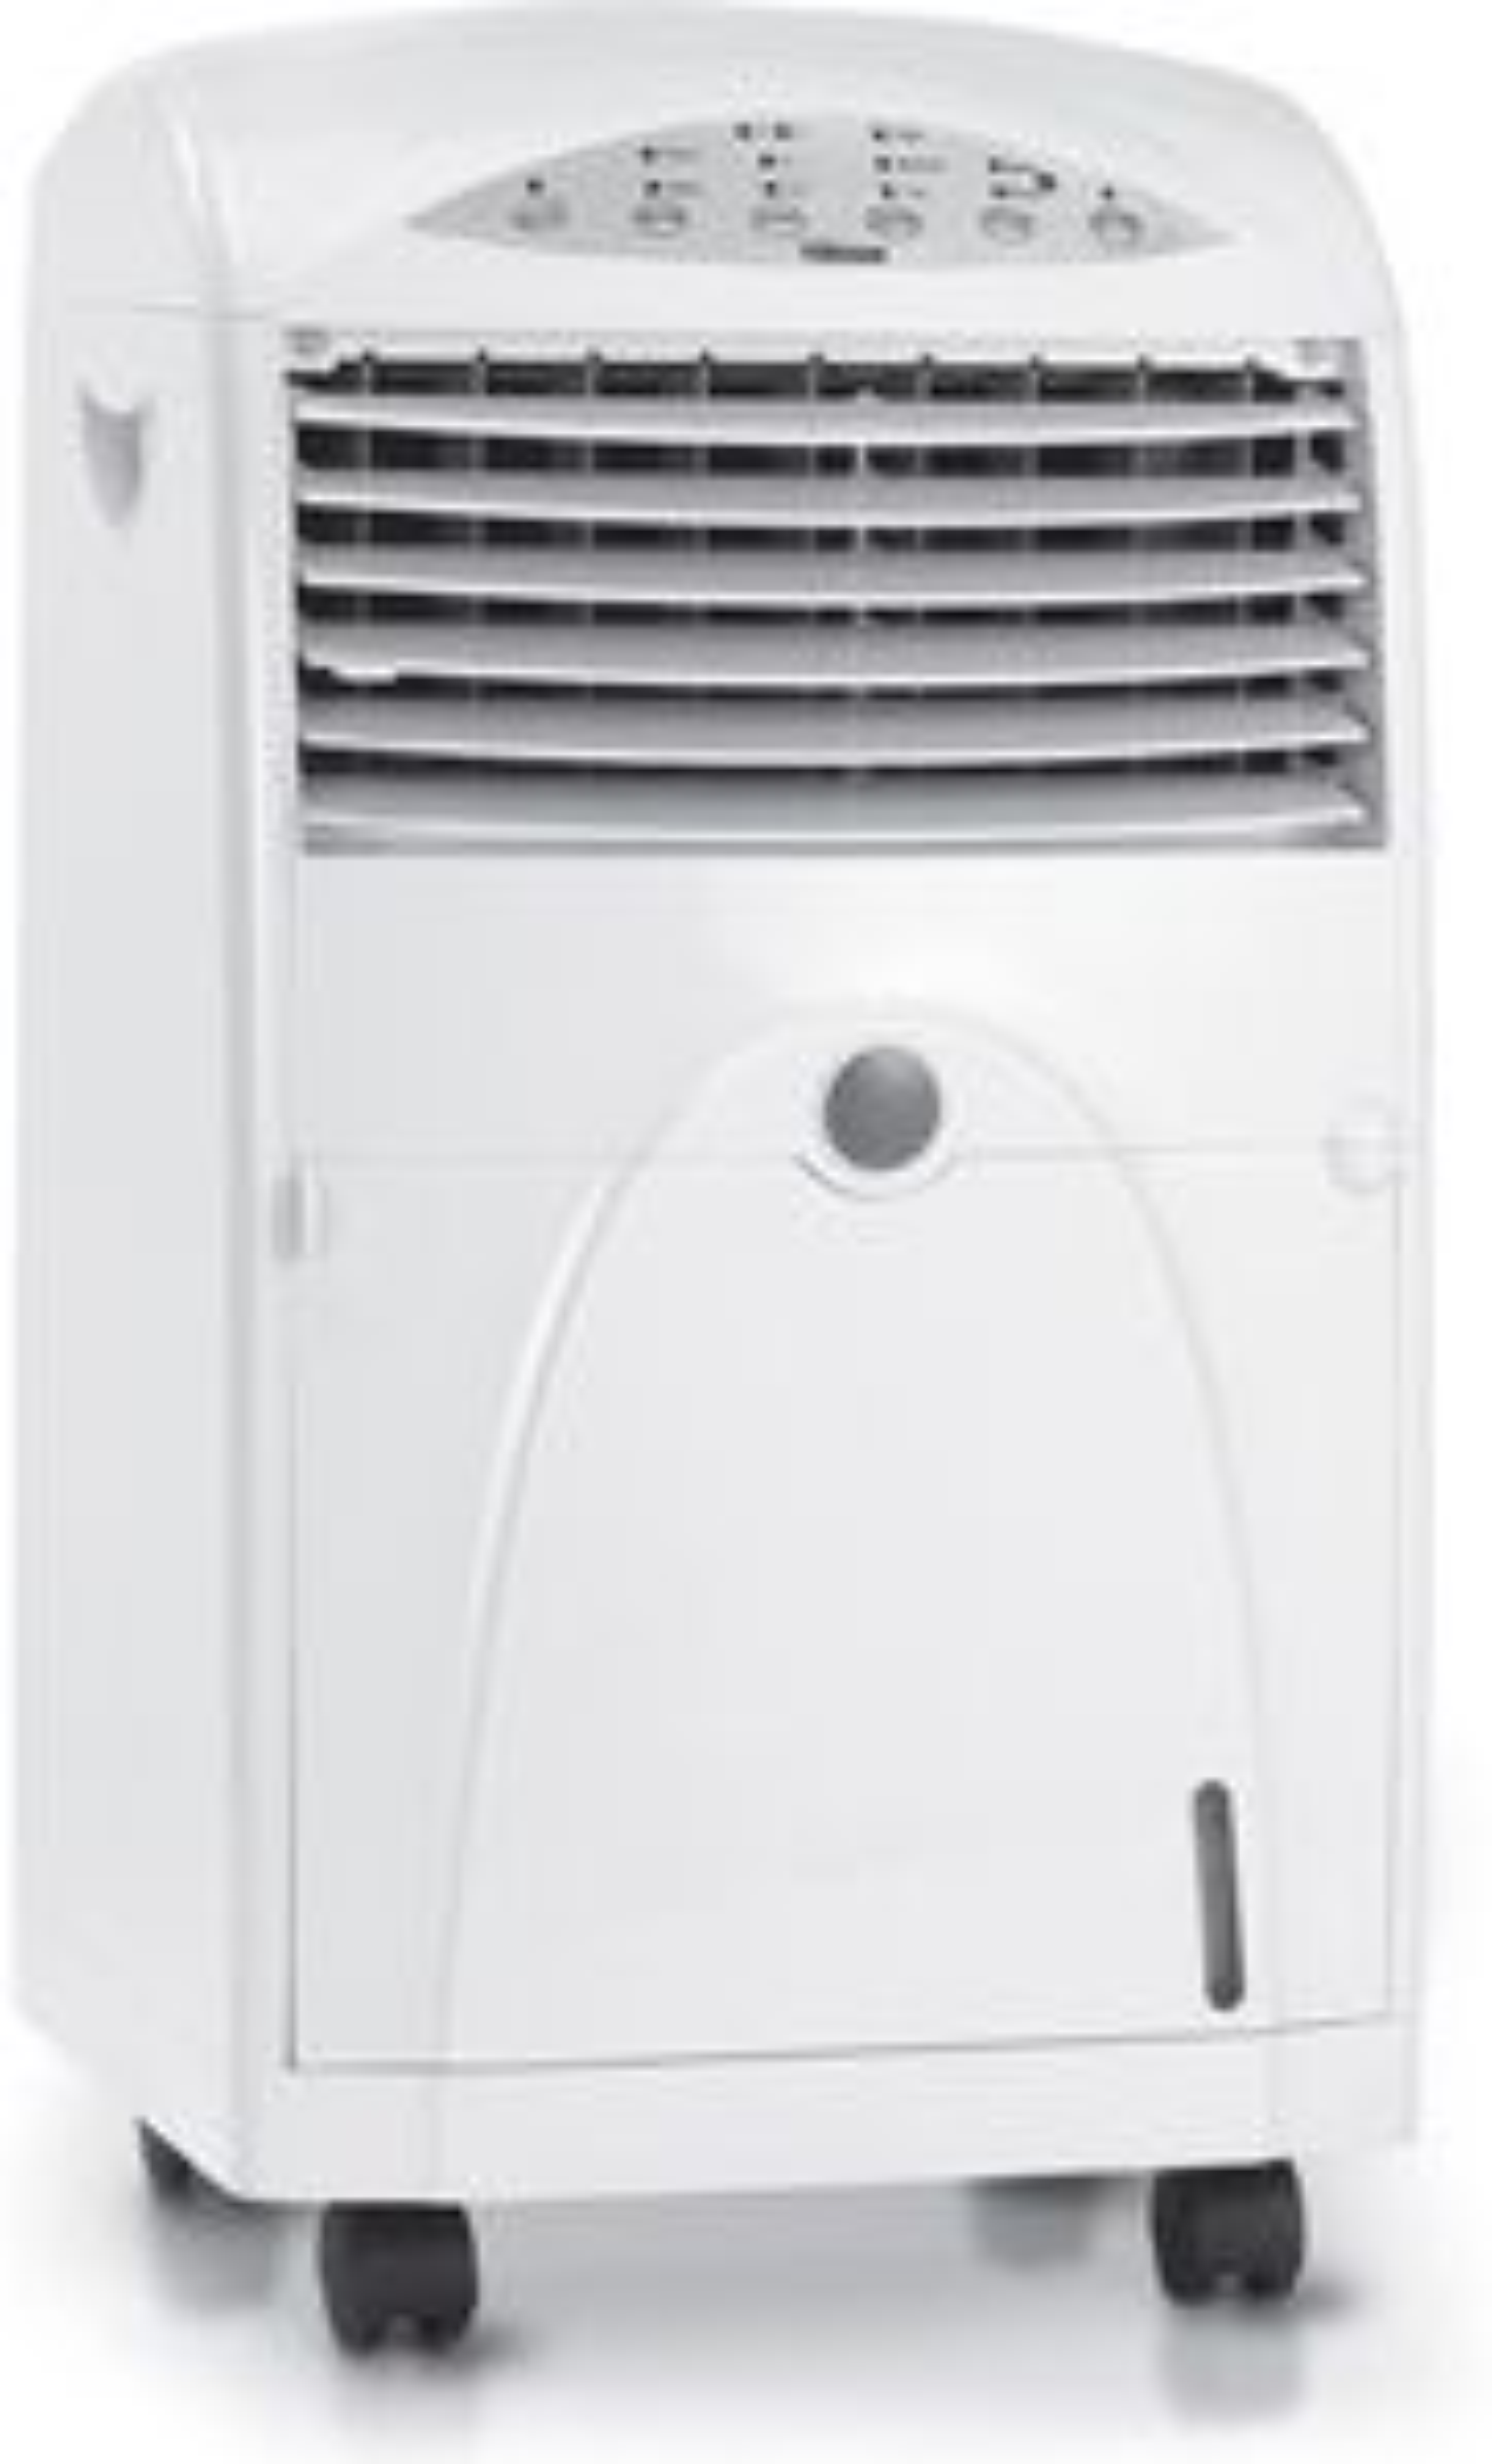 Sandstrøm aircondition sac07c15e